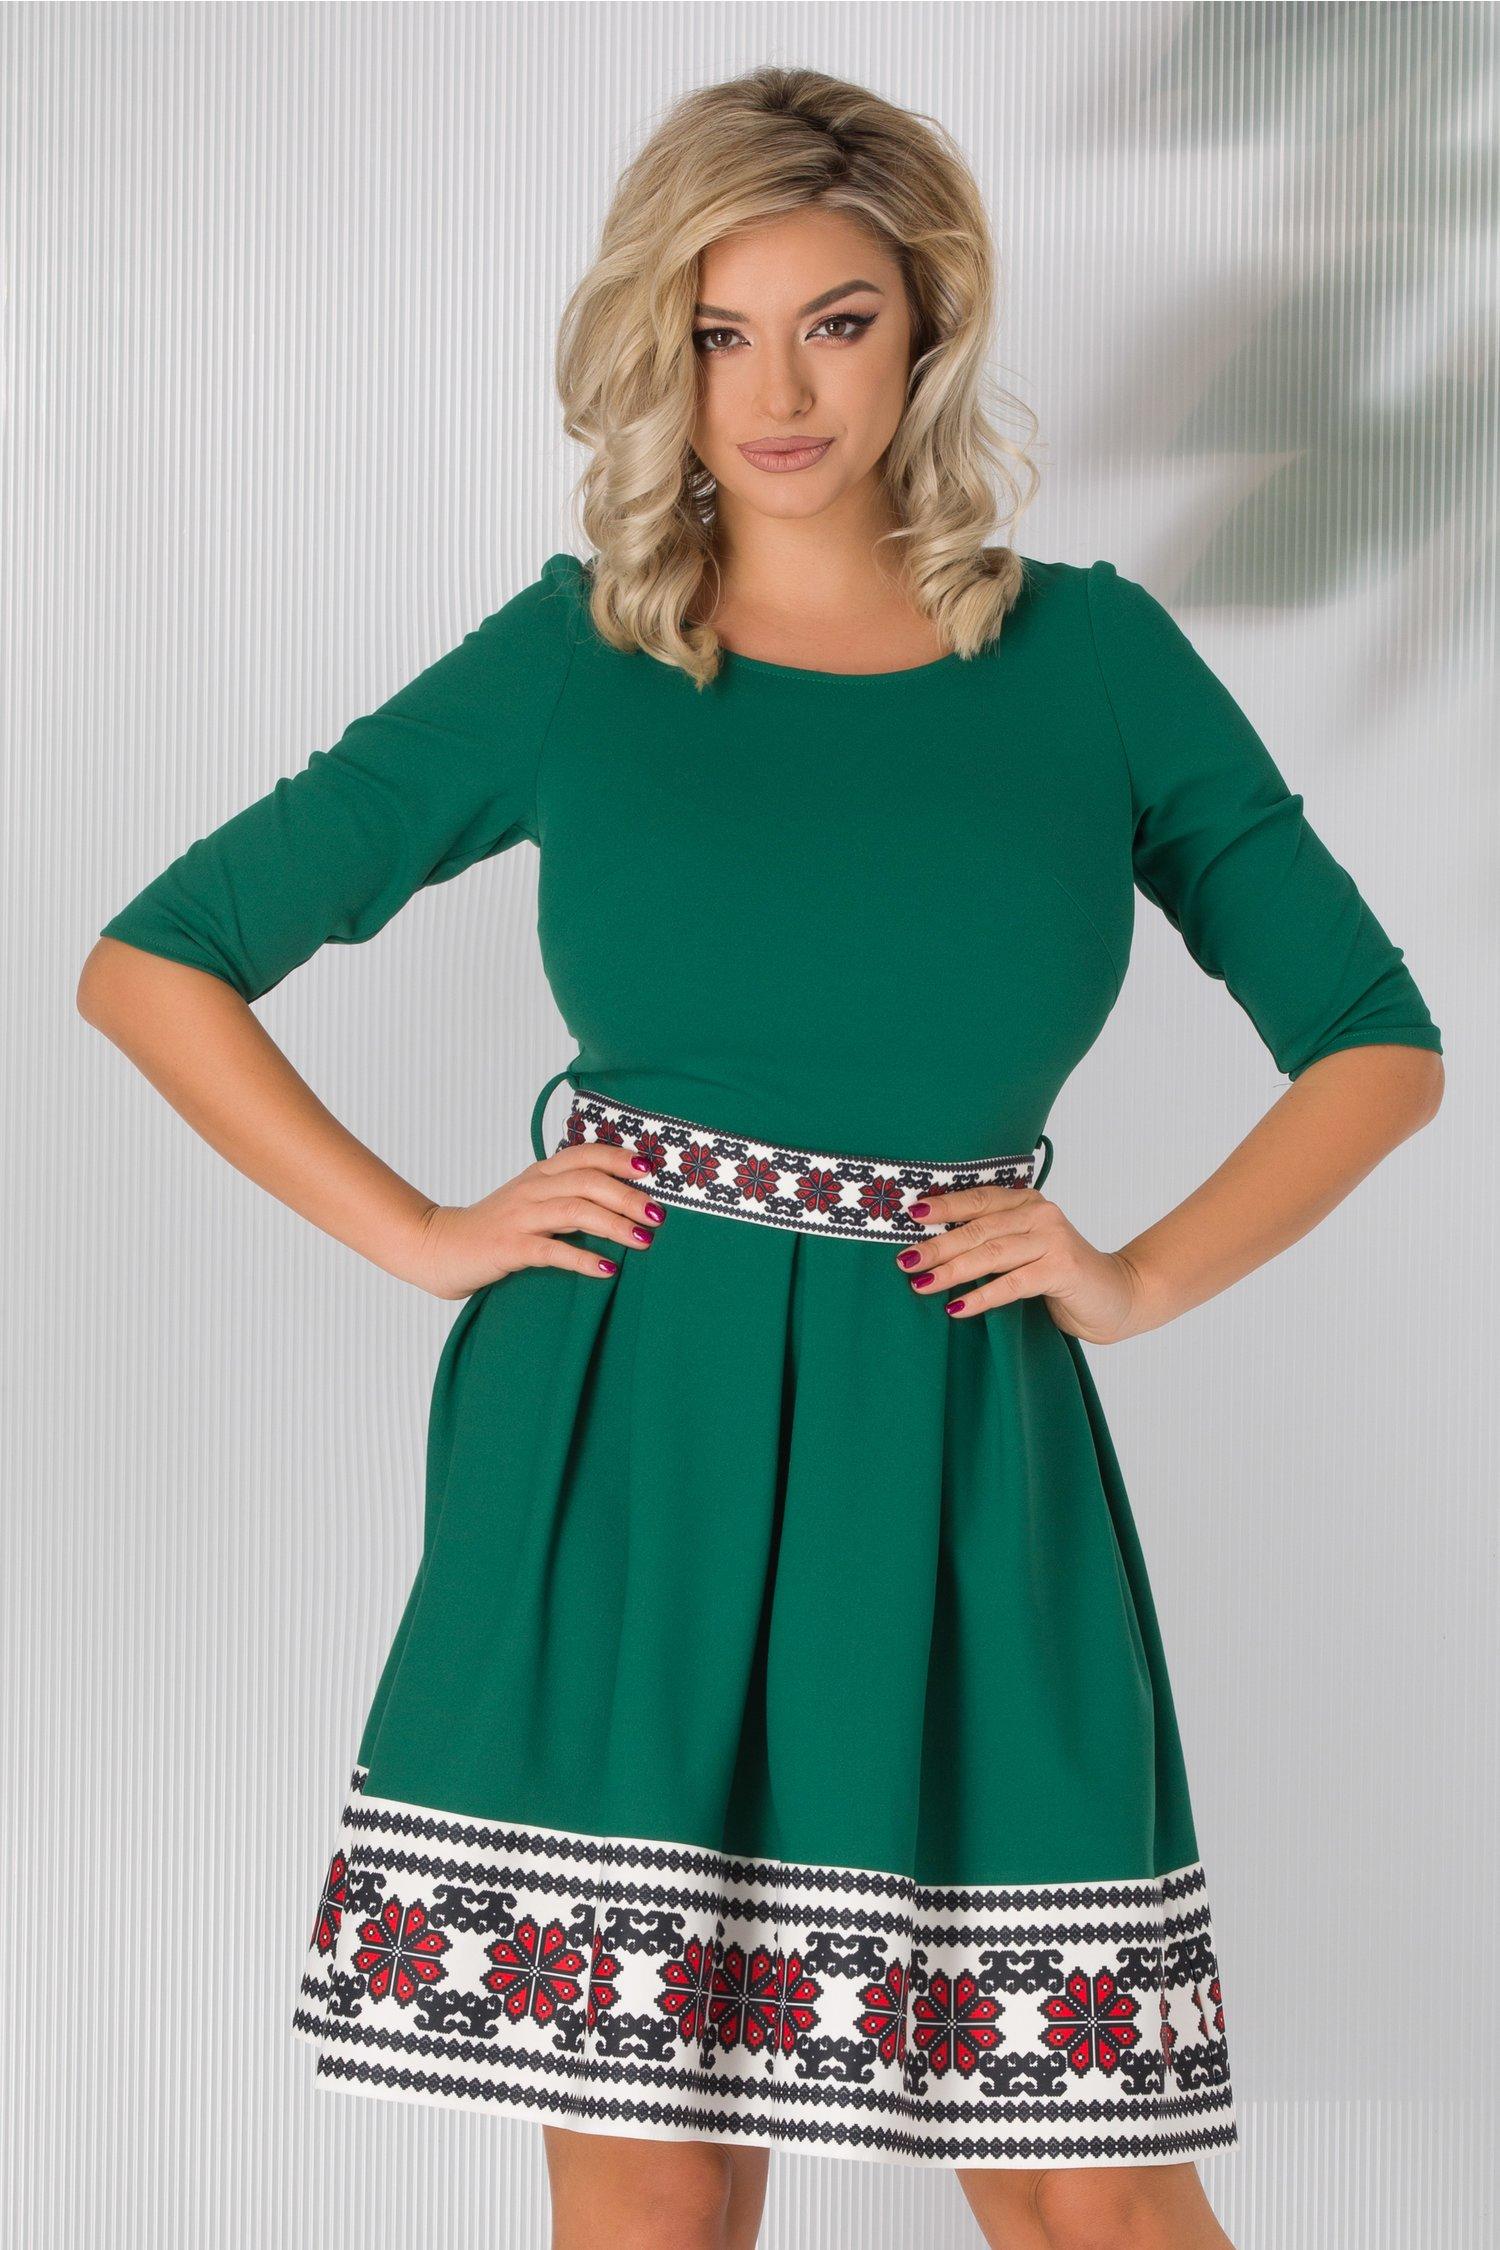 Rochie Elena verde cu imprimeu traditional la baza si cordon in talie